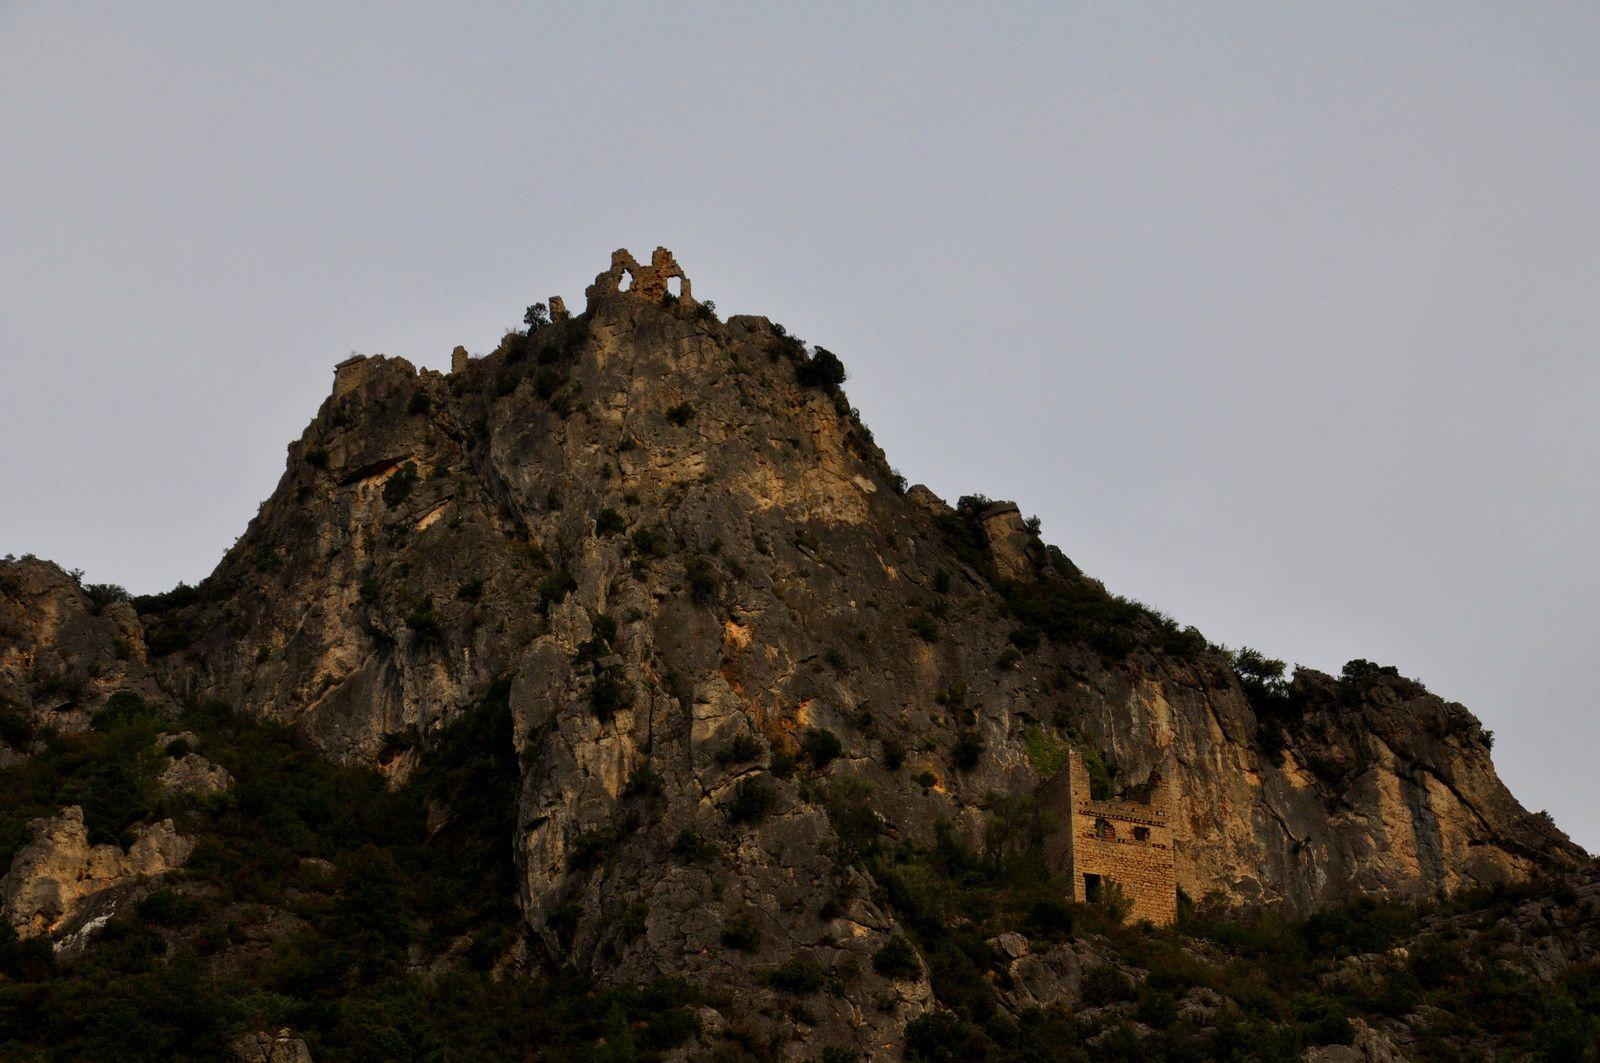 Le château, la visite avec la balade sera faite.